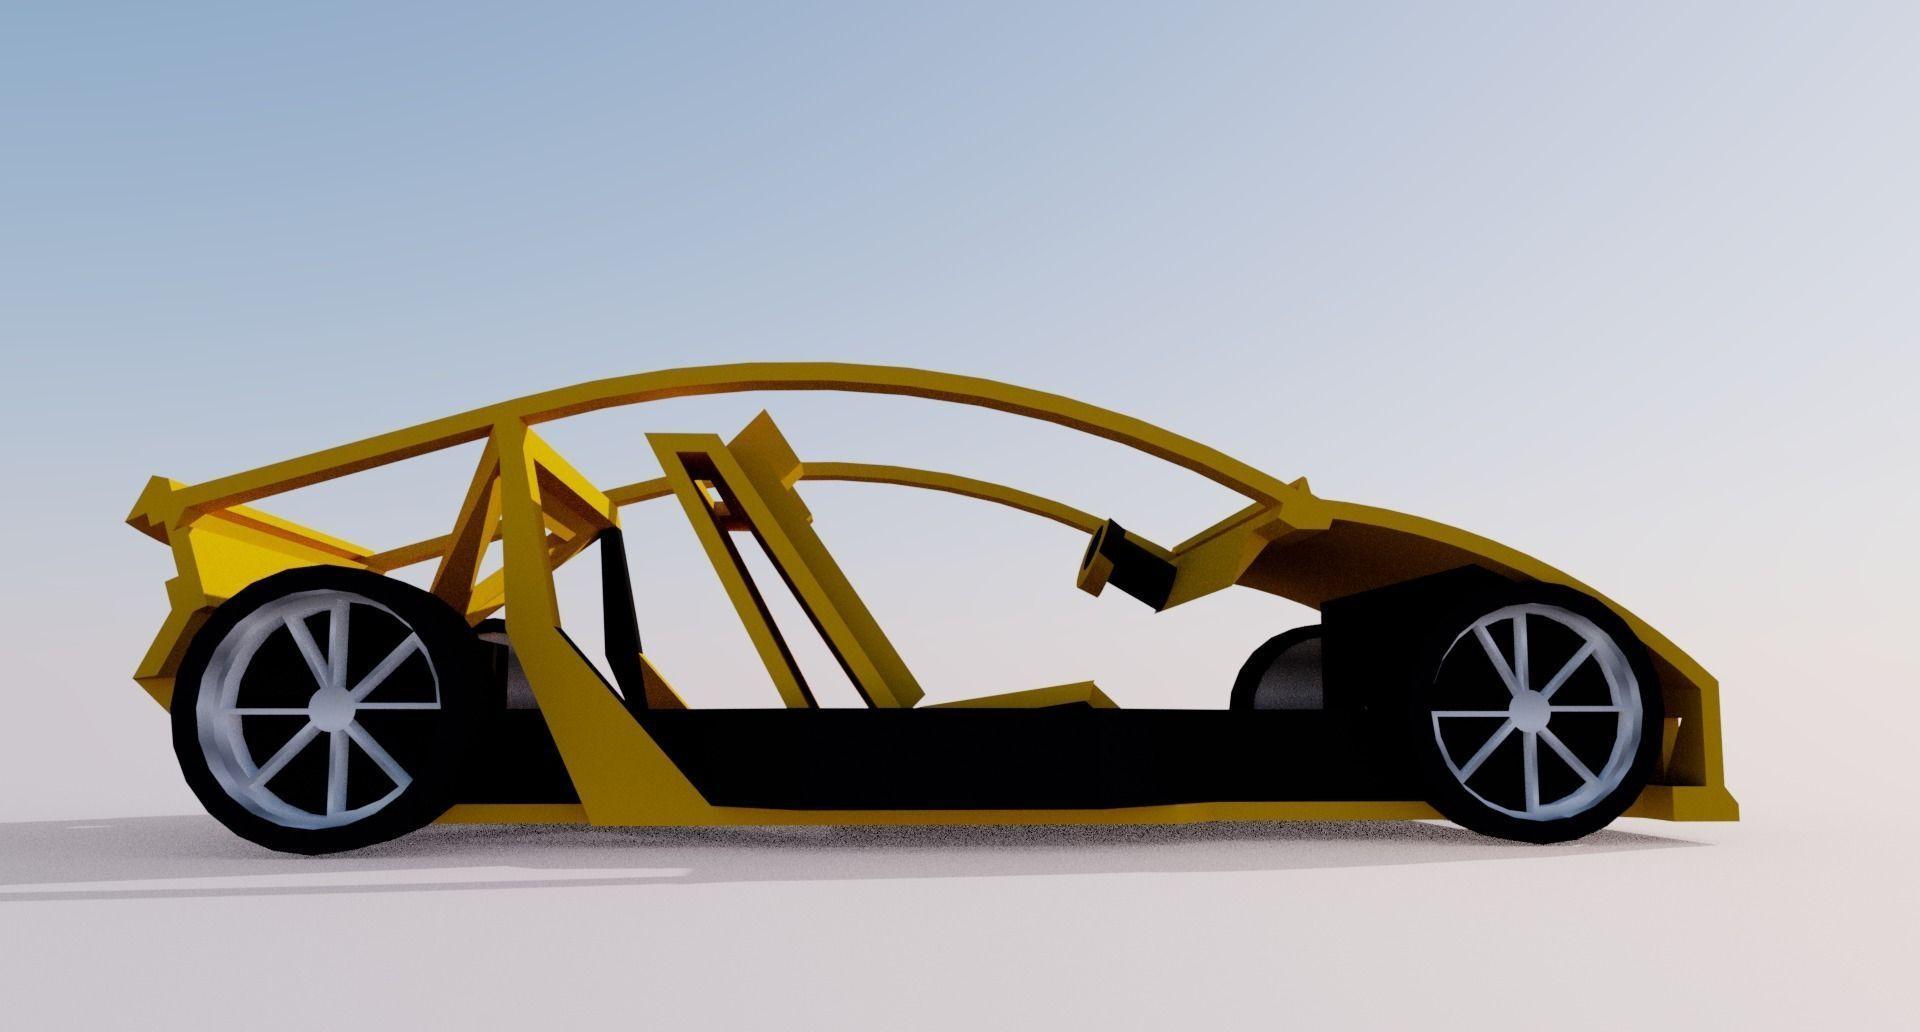 Design of car frame -  Extruda Modulare Electric Race Car Frame 3d Model Fbx 4